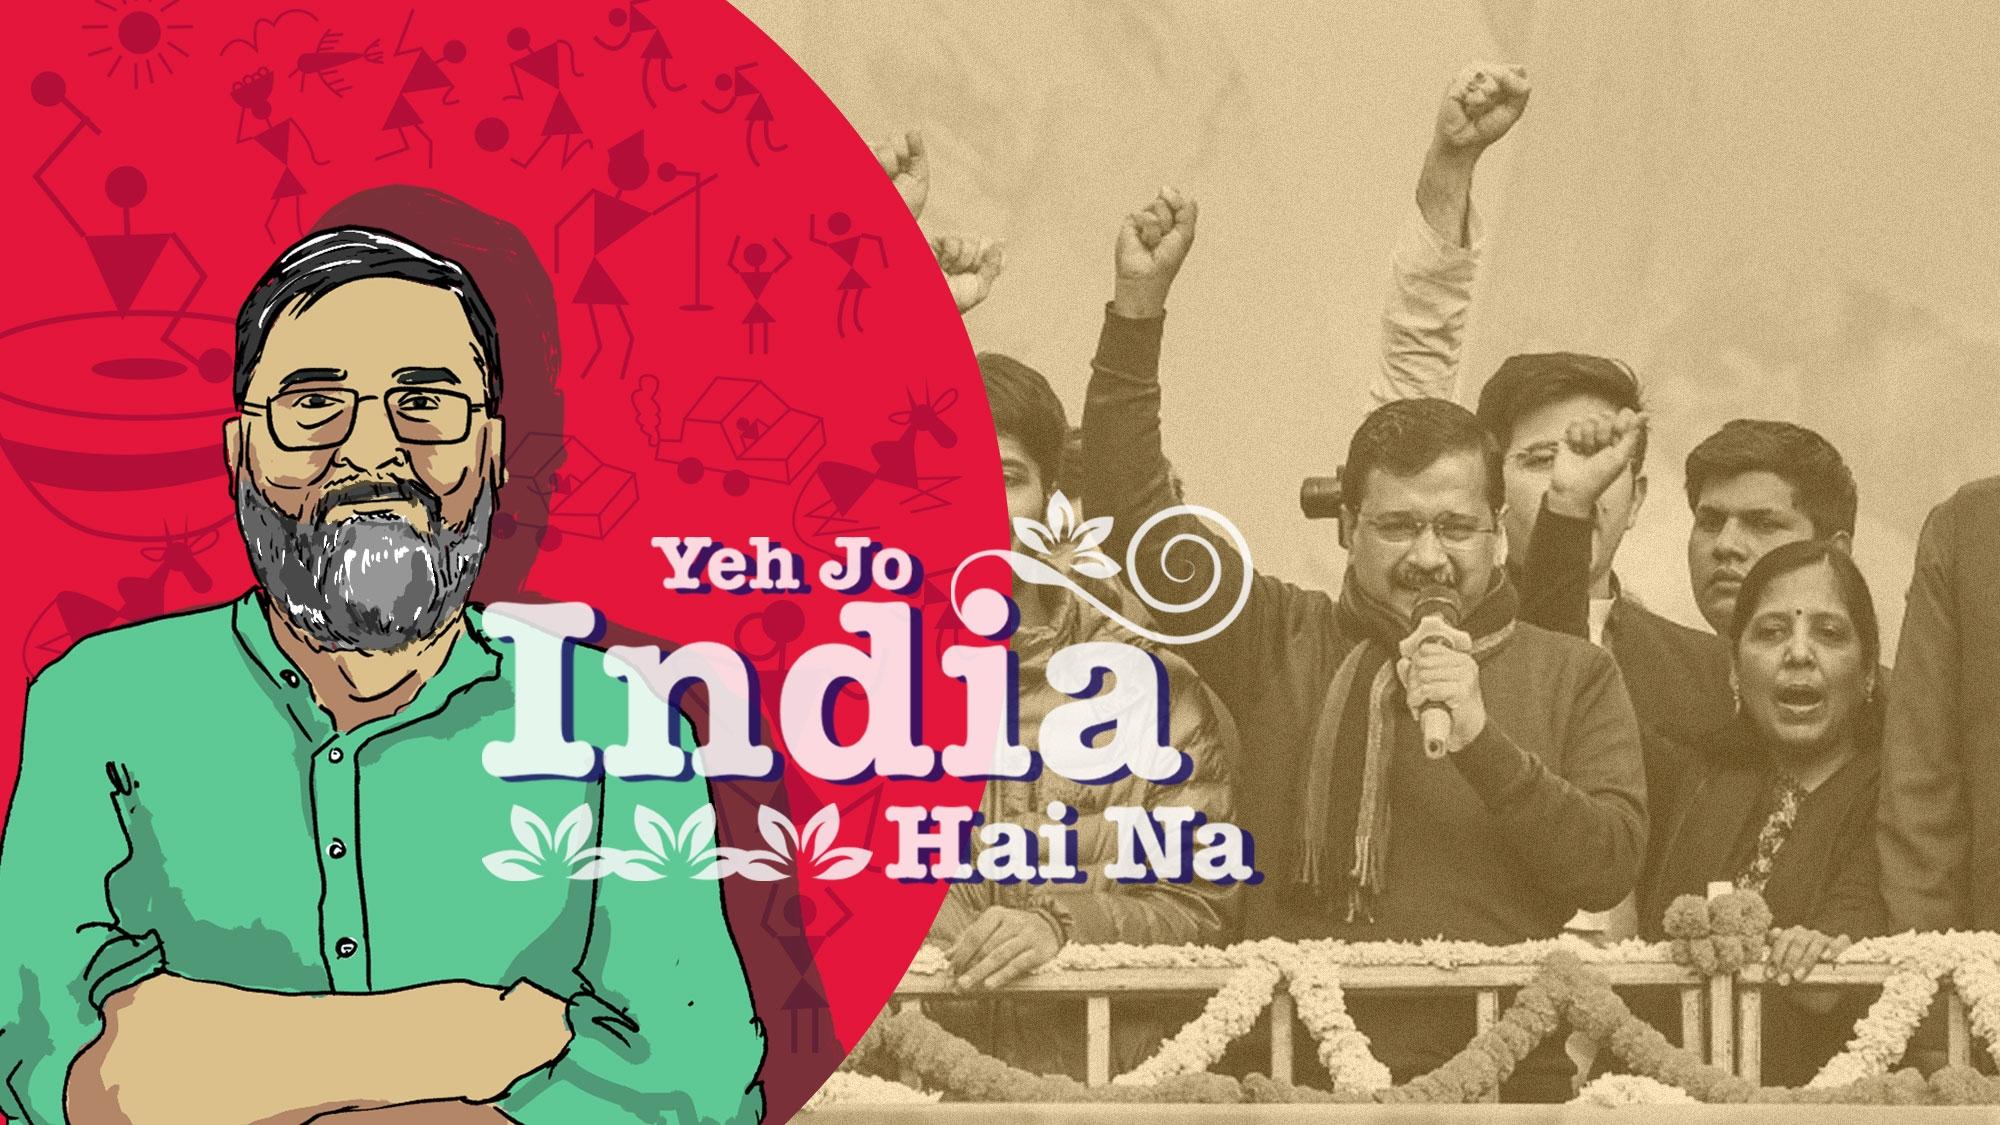 Delhi Rejects Hate Politics: Shaheen Bagh 'Shocks' The BJP